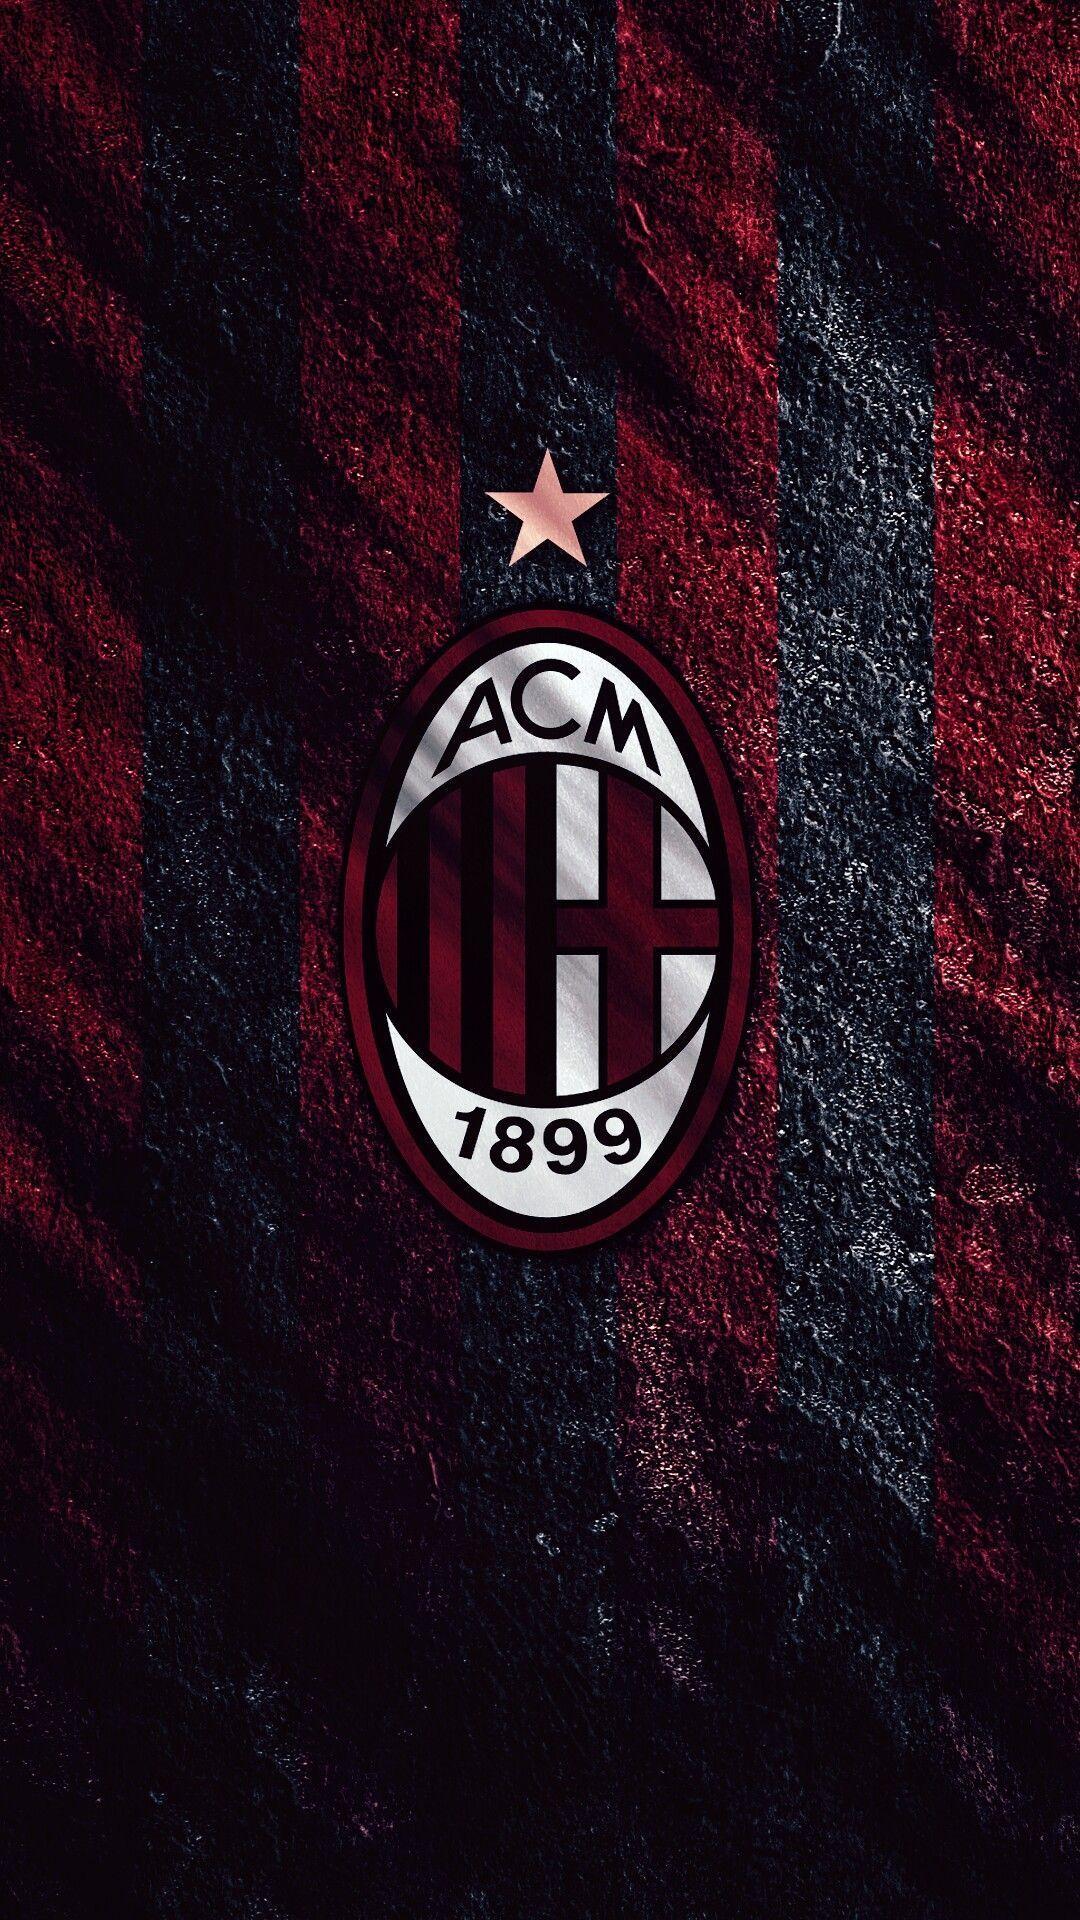 Ac Milan Wallpaper Footballclubwallpapers Sepak Bola Bola Kaki